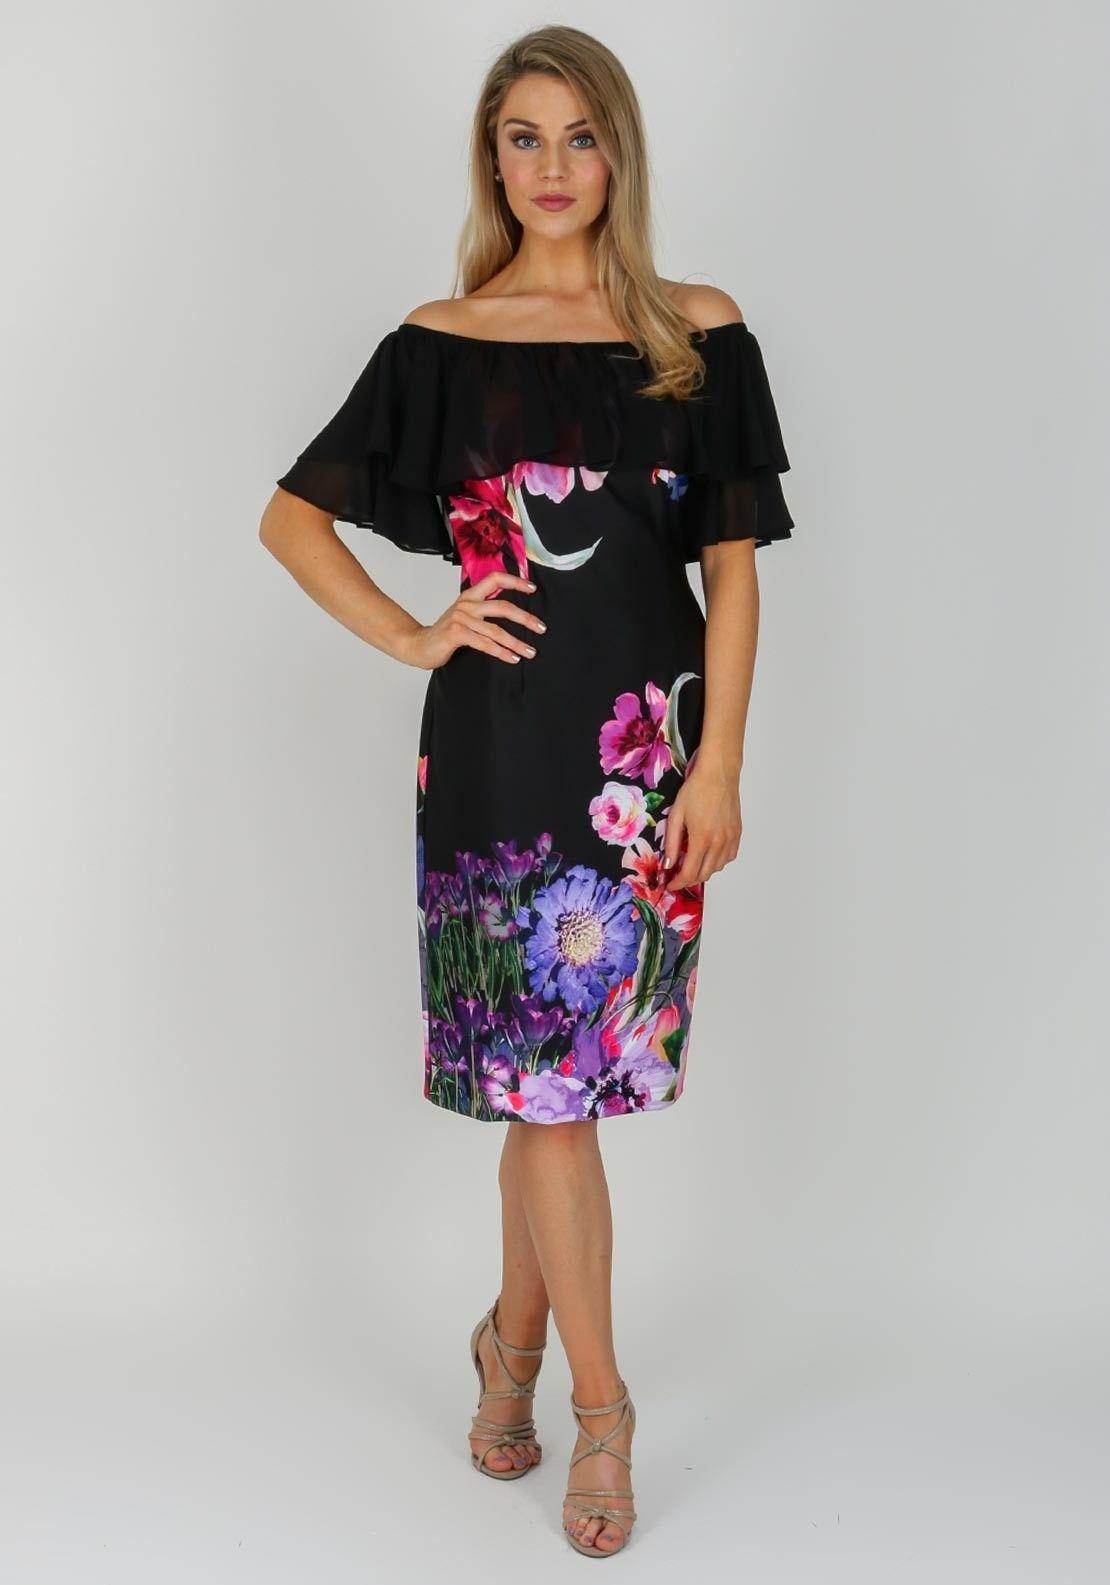 Joseph Ribkoff Floral Bardot Dress Black Multi Floral Bardot Dress Bardot Dress Dresses [ 1585 x 1110 Pixel ]